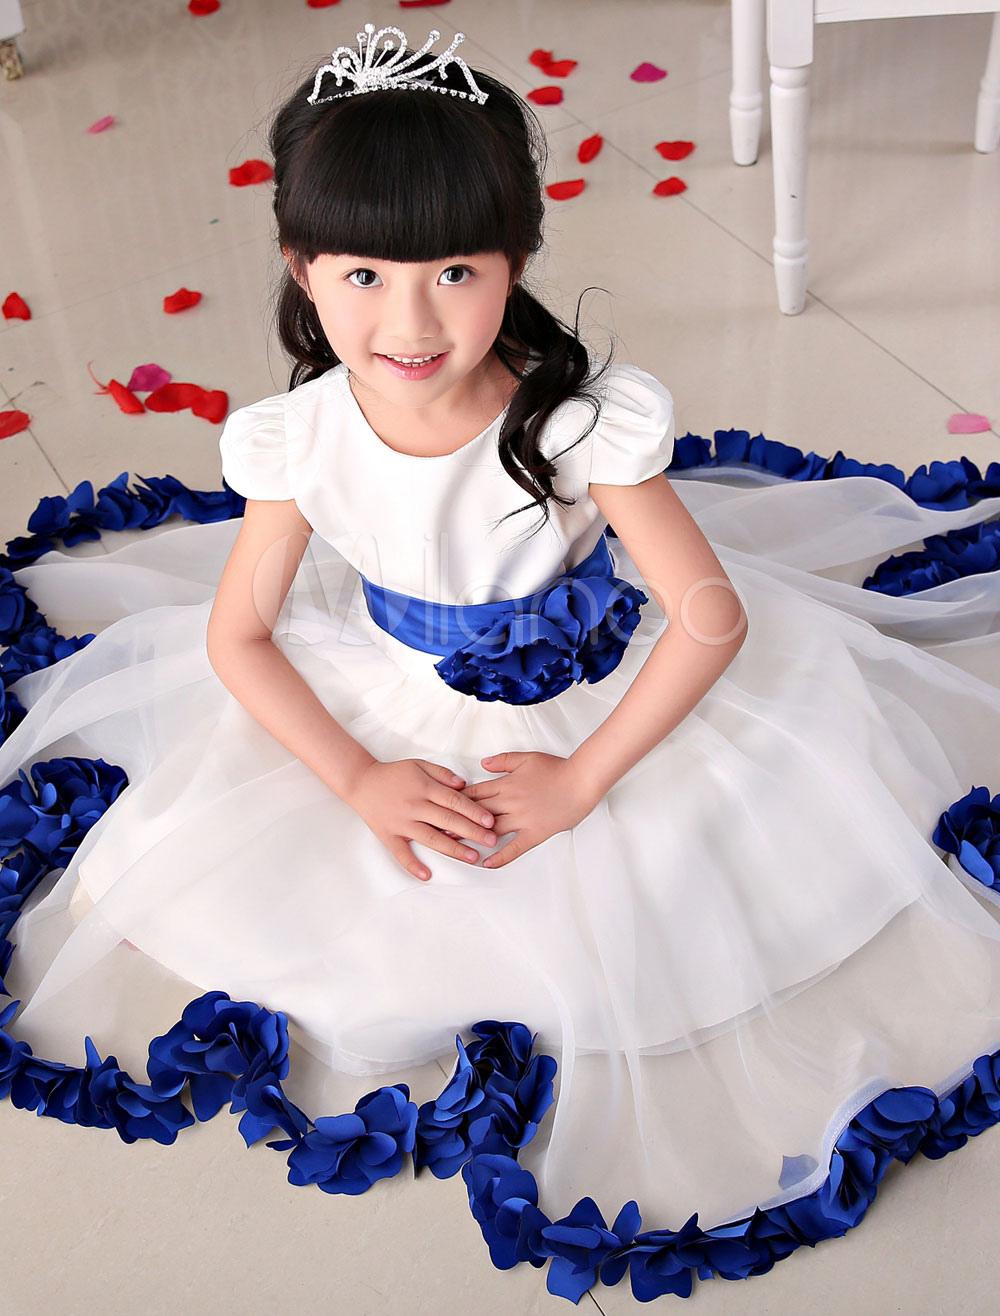 Flower Girl Dresses Ivory Organza Short Sleeve Blue Applique Flower A Line Tea Length Ball Gown Dress With Satin Sash